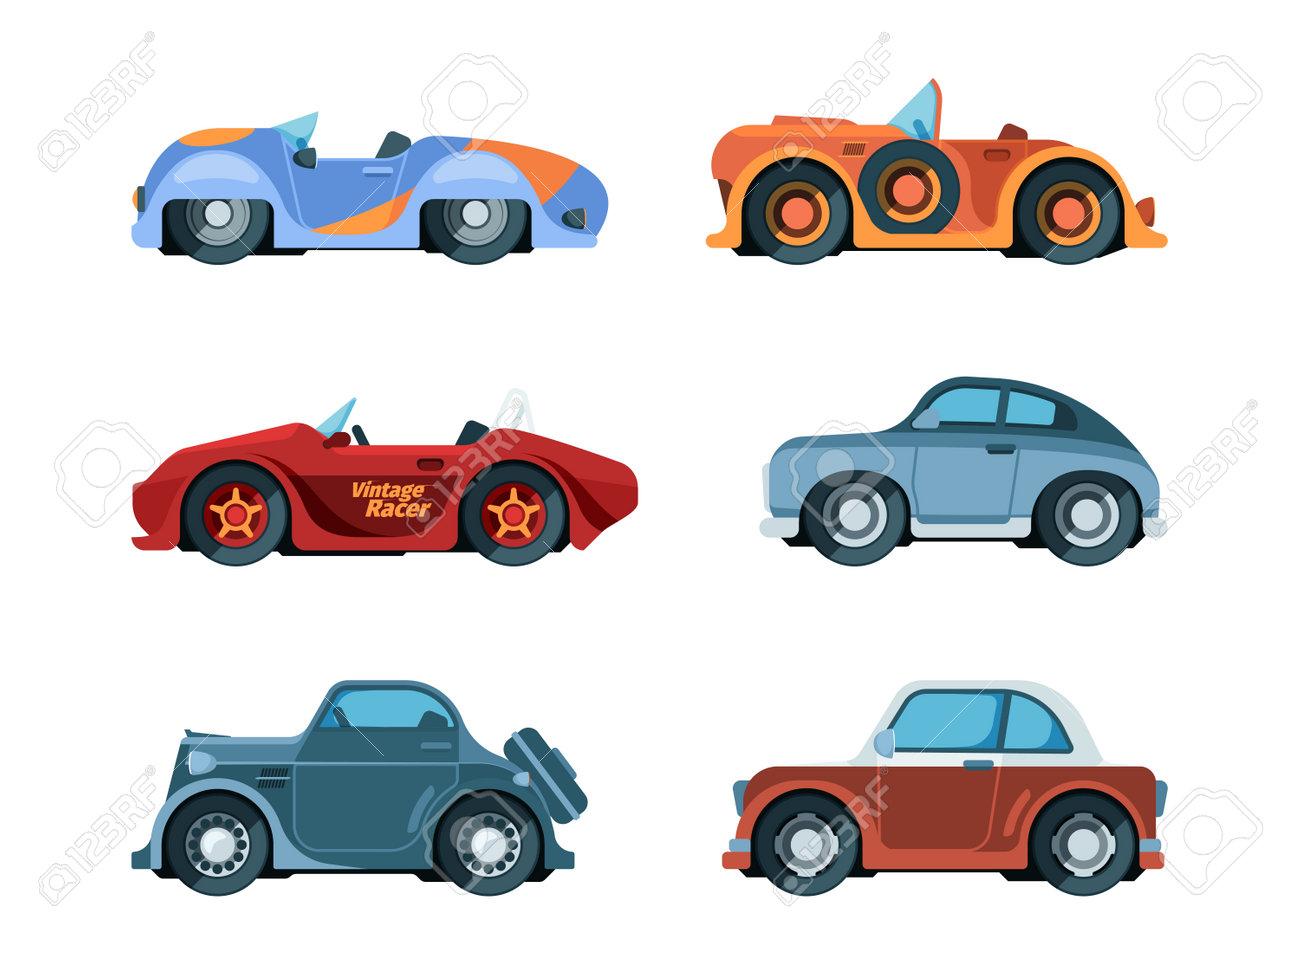 Retro cars. Old style vehicles urban transportation wheels driving car garish vector vintage collection in flat style. Car retro, classic old vintage vehicle illustration - 166224065